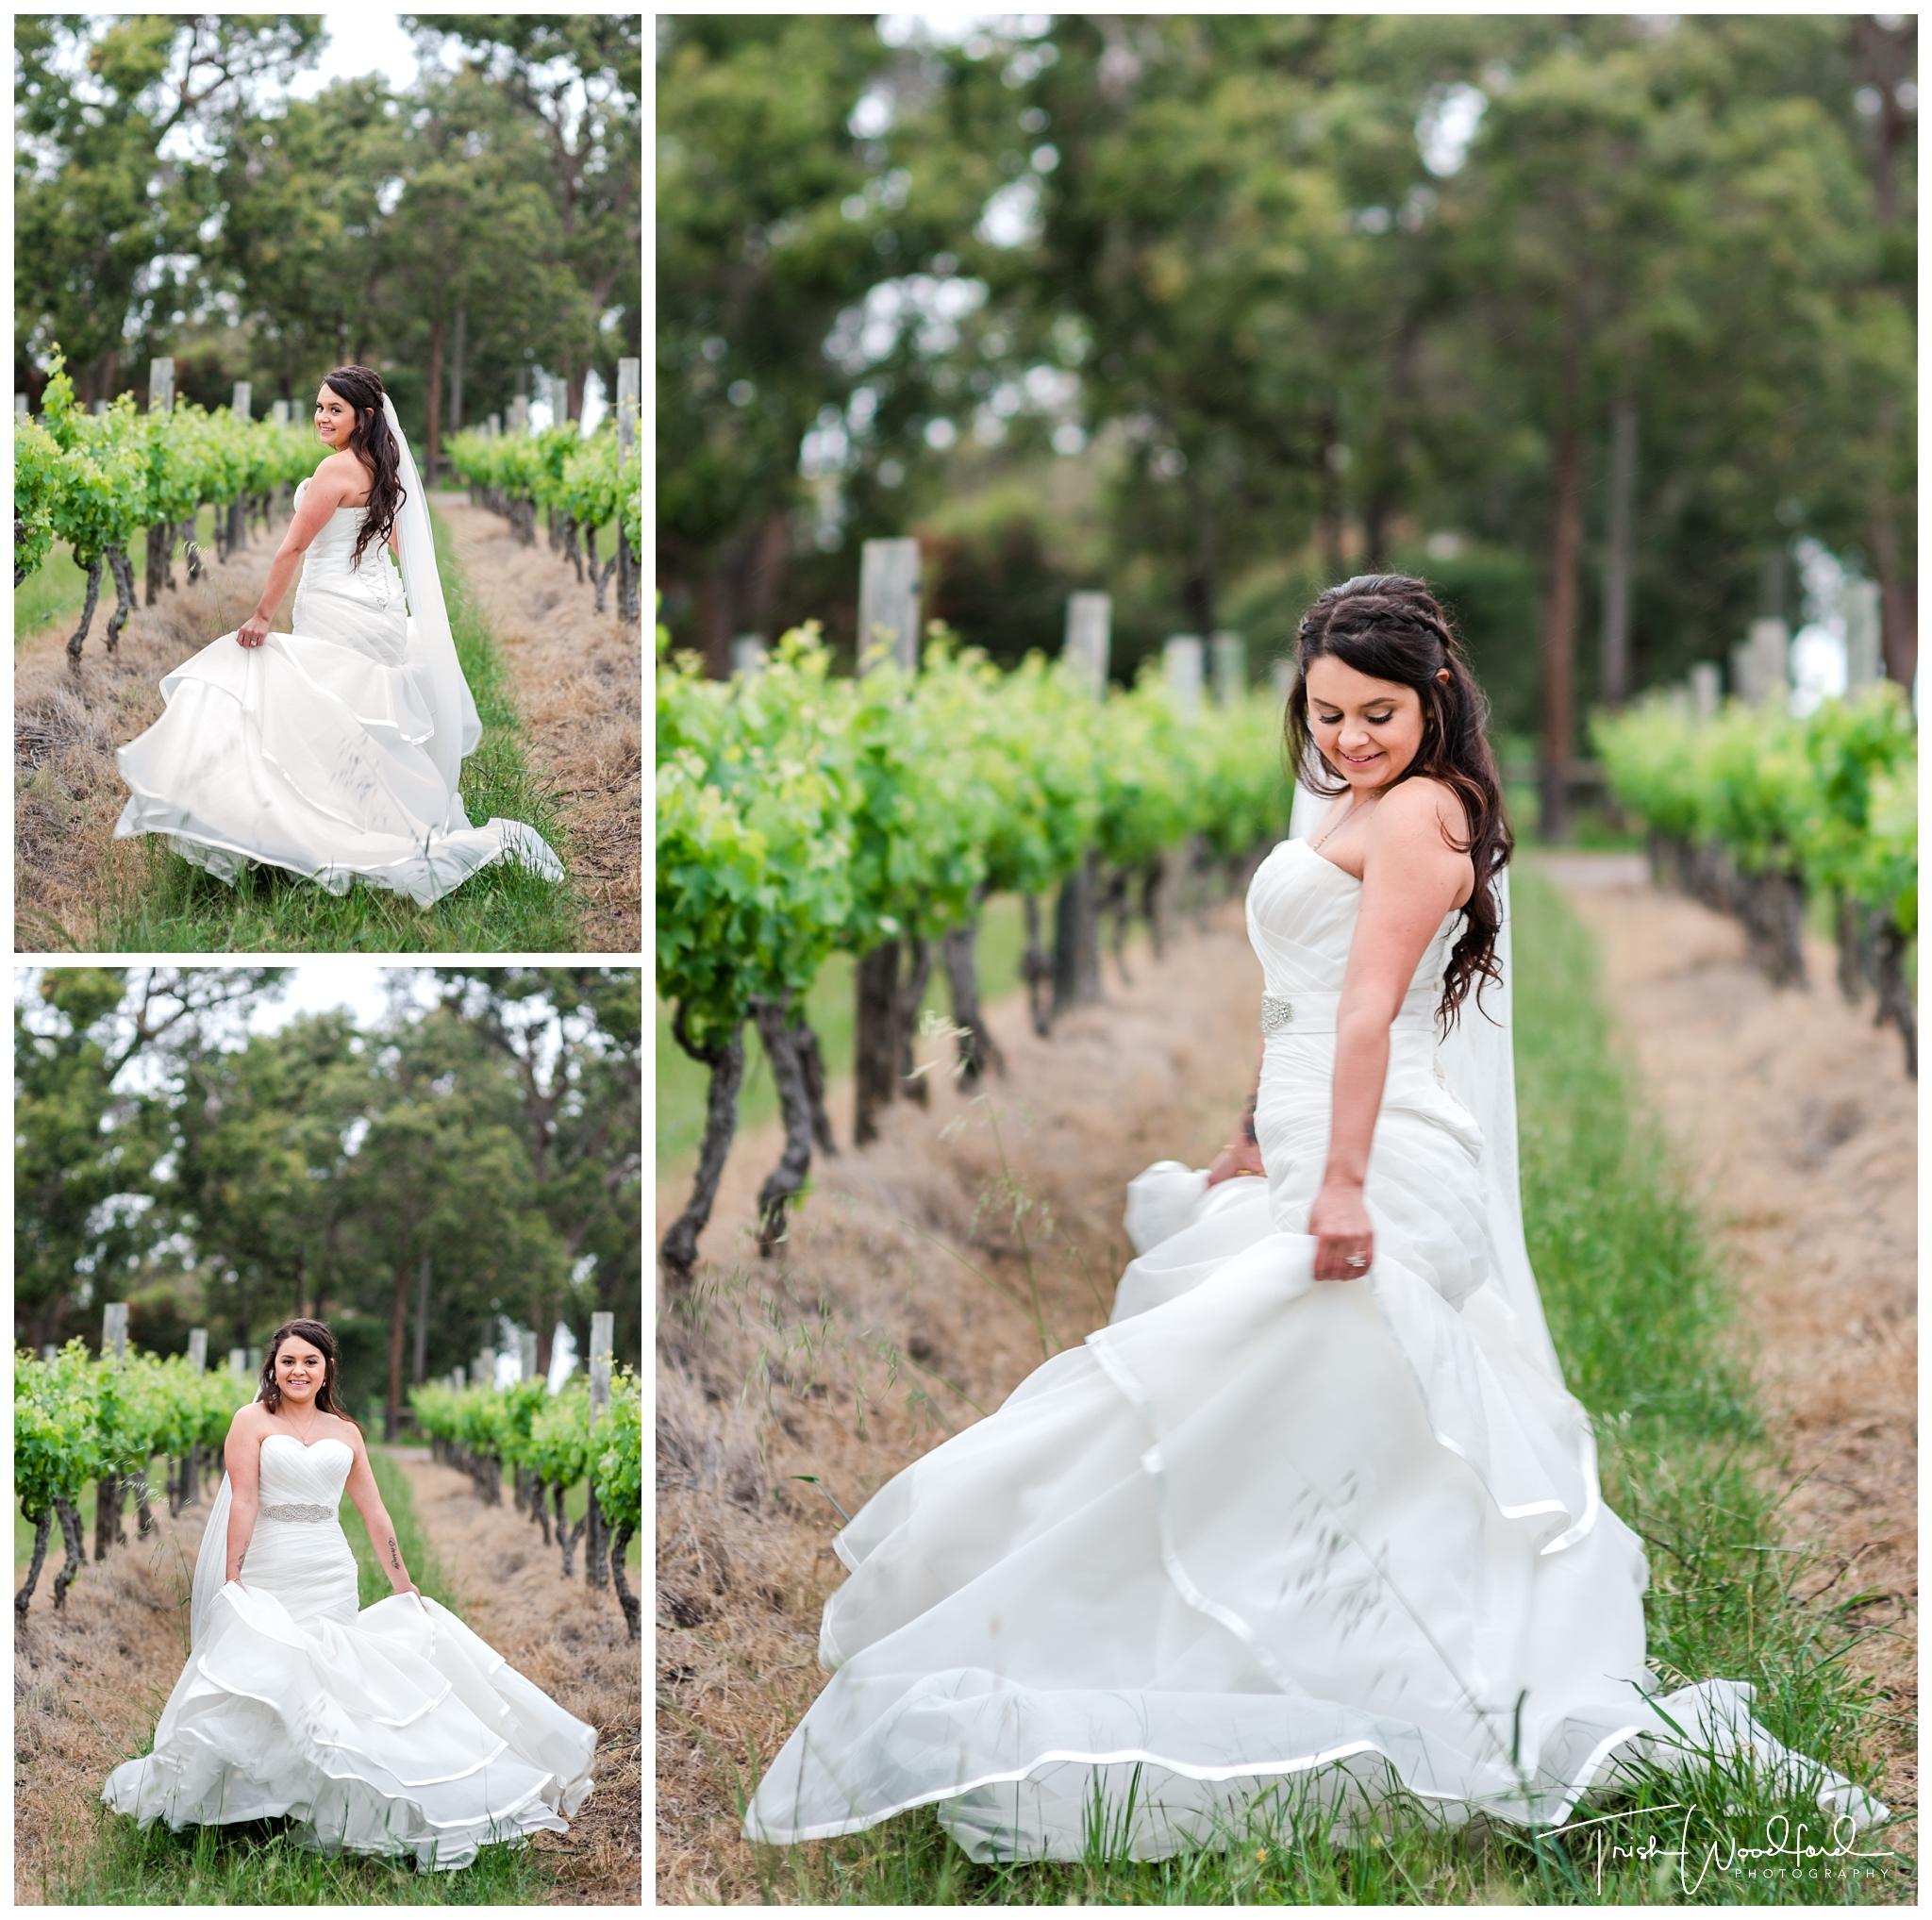 BridePortraitSandalfordWedding